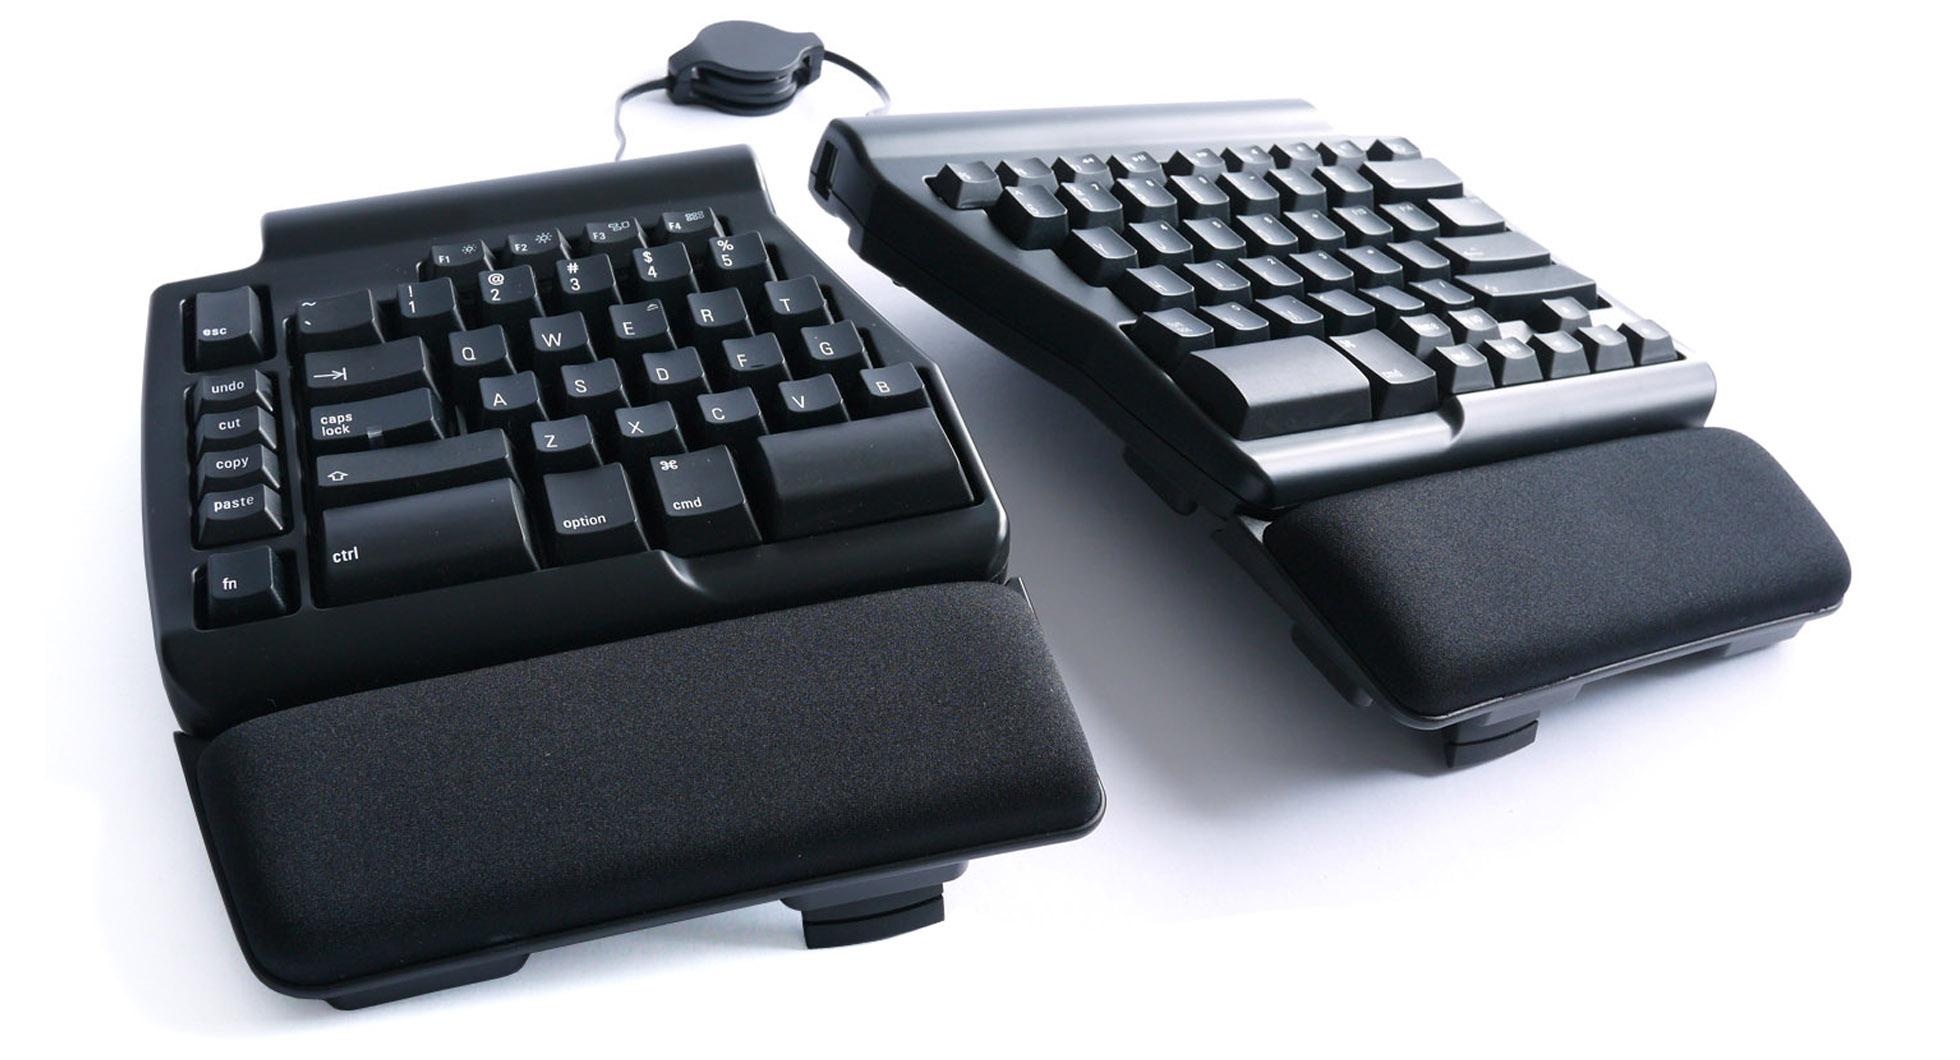 Matias Ergo Pro Ergonomic Keyboard Review